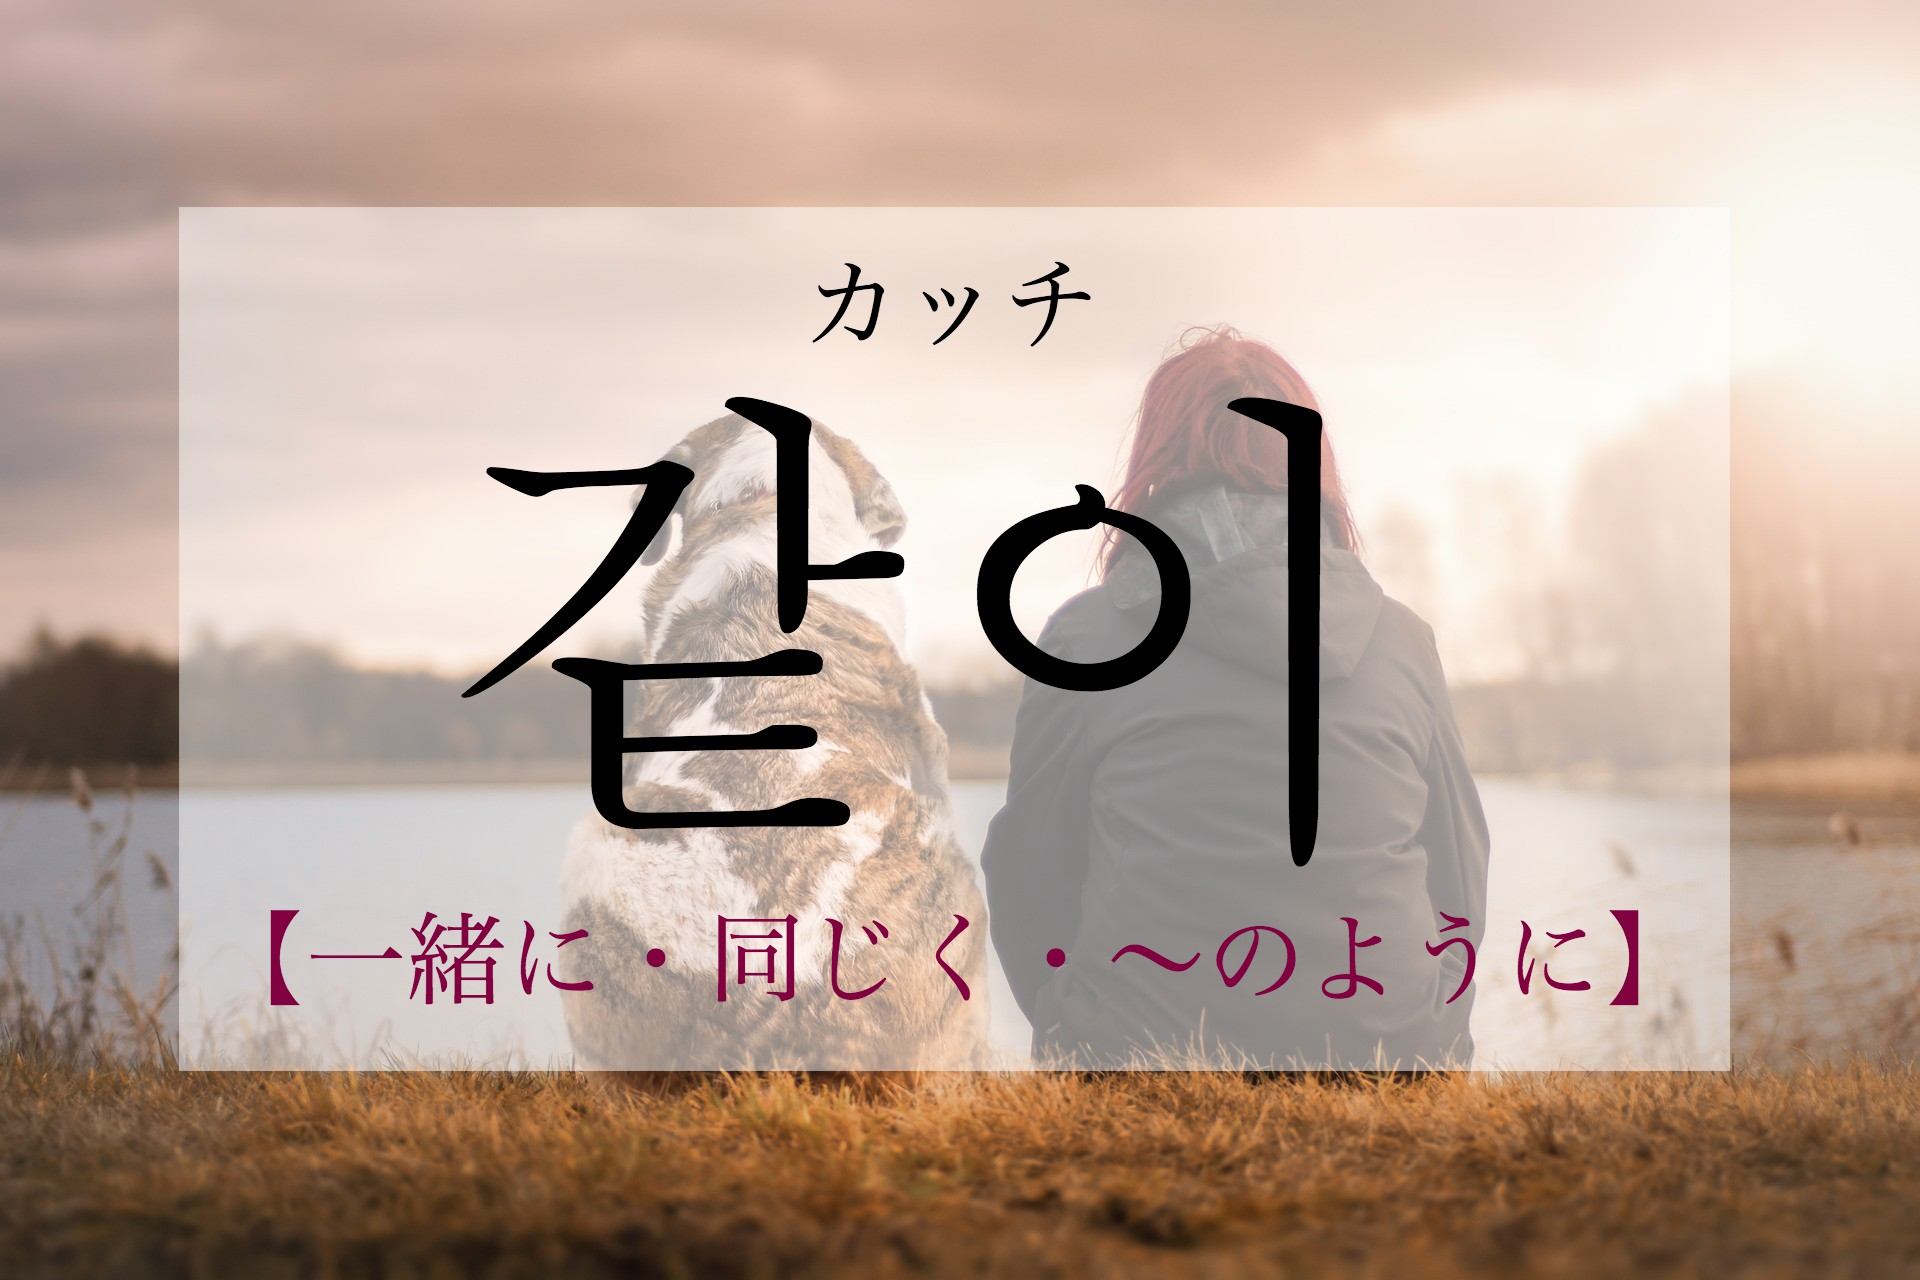 koreanword-with